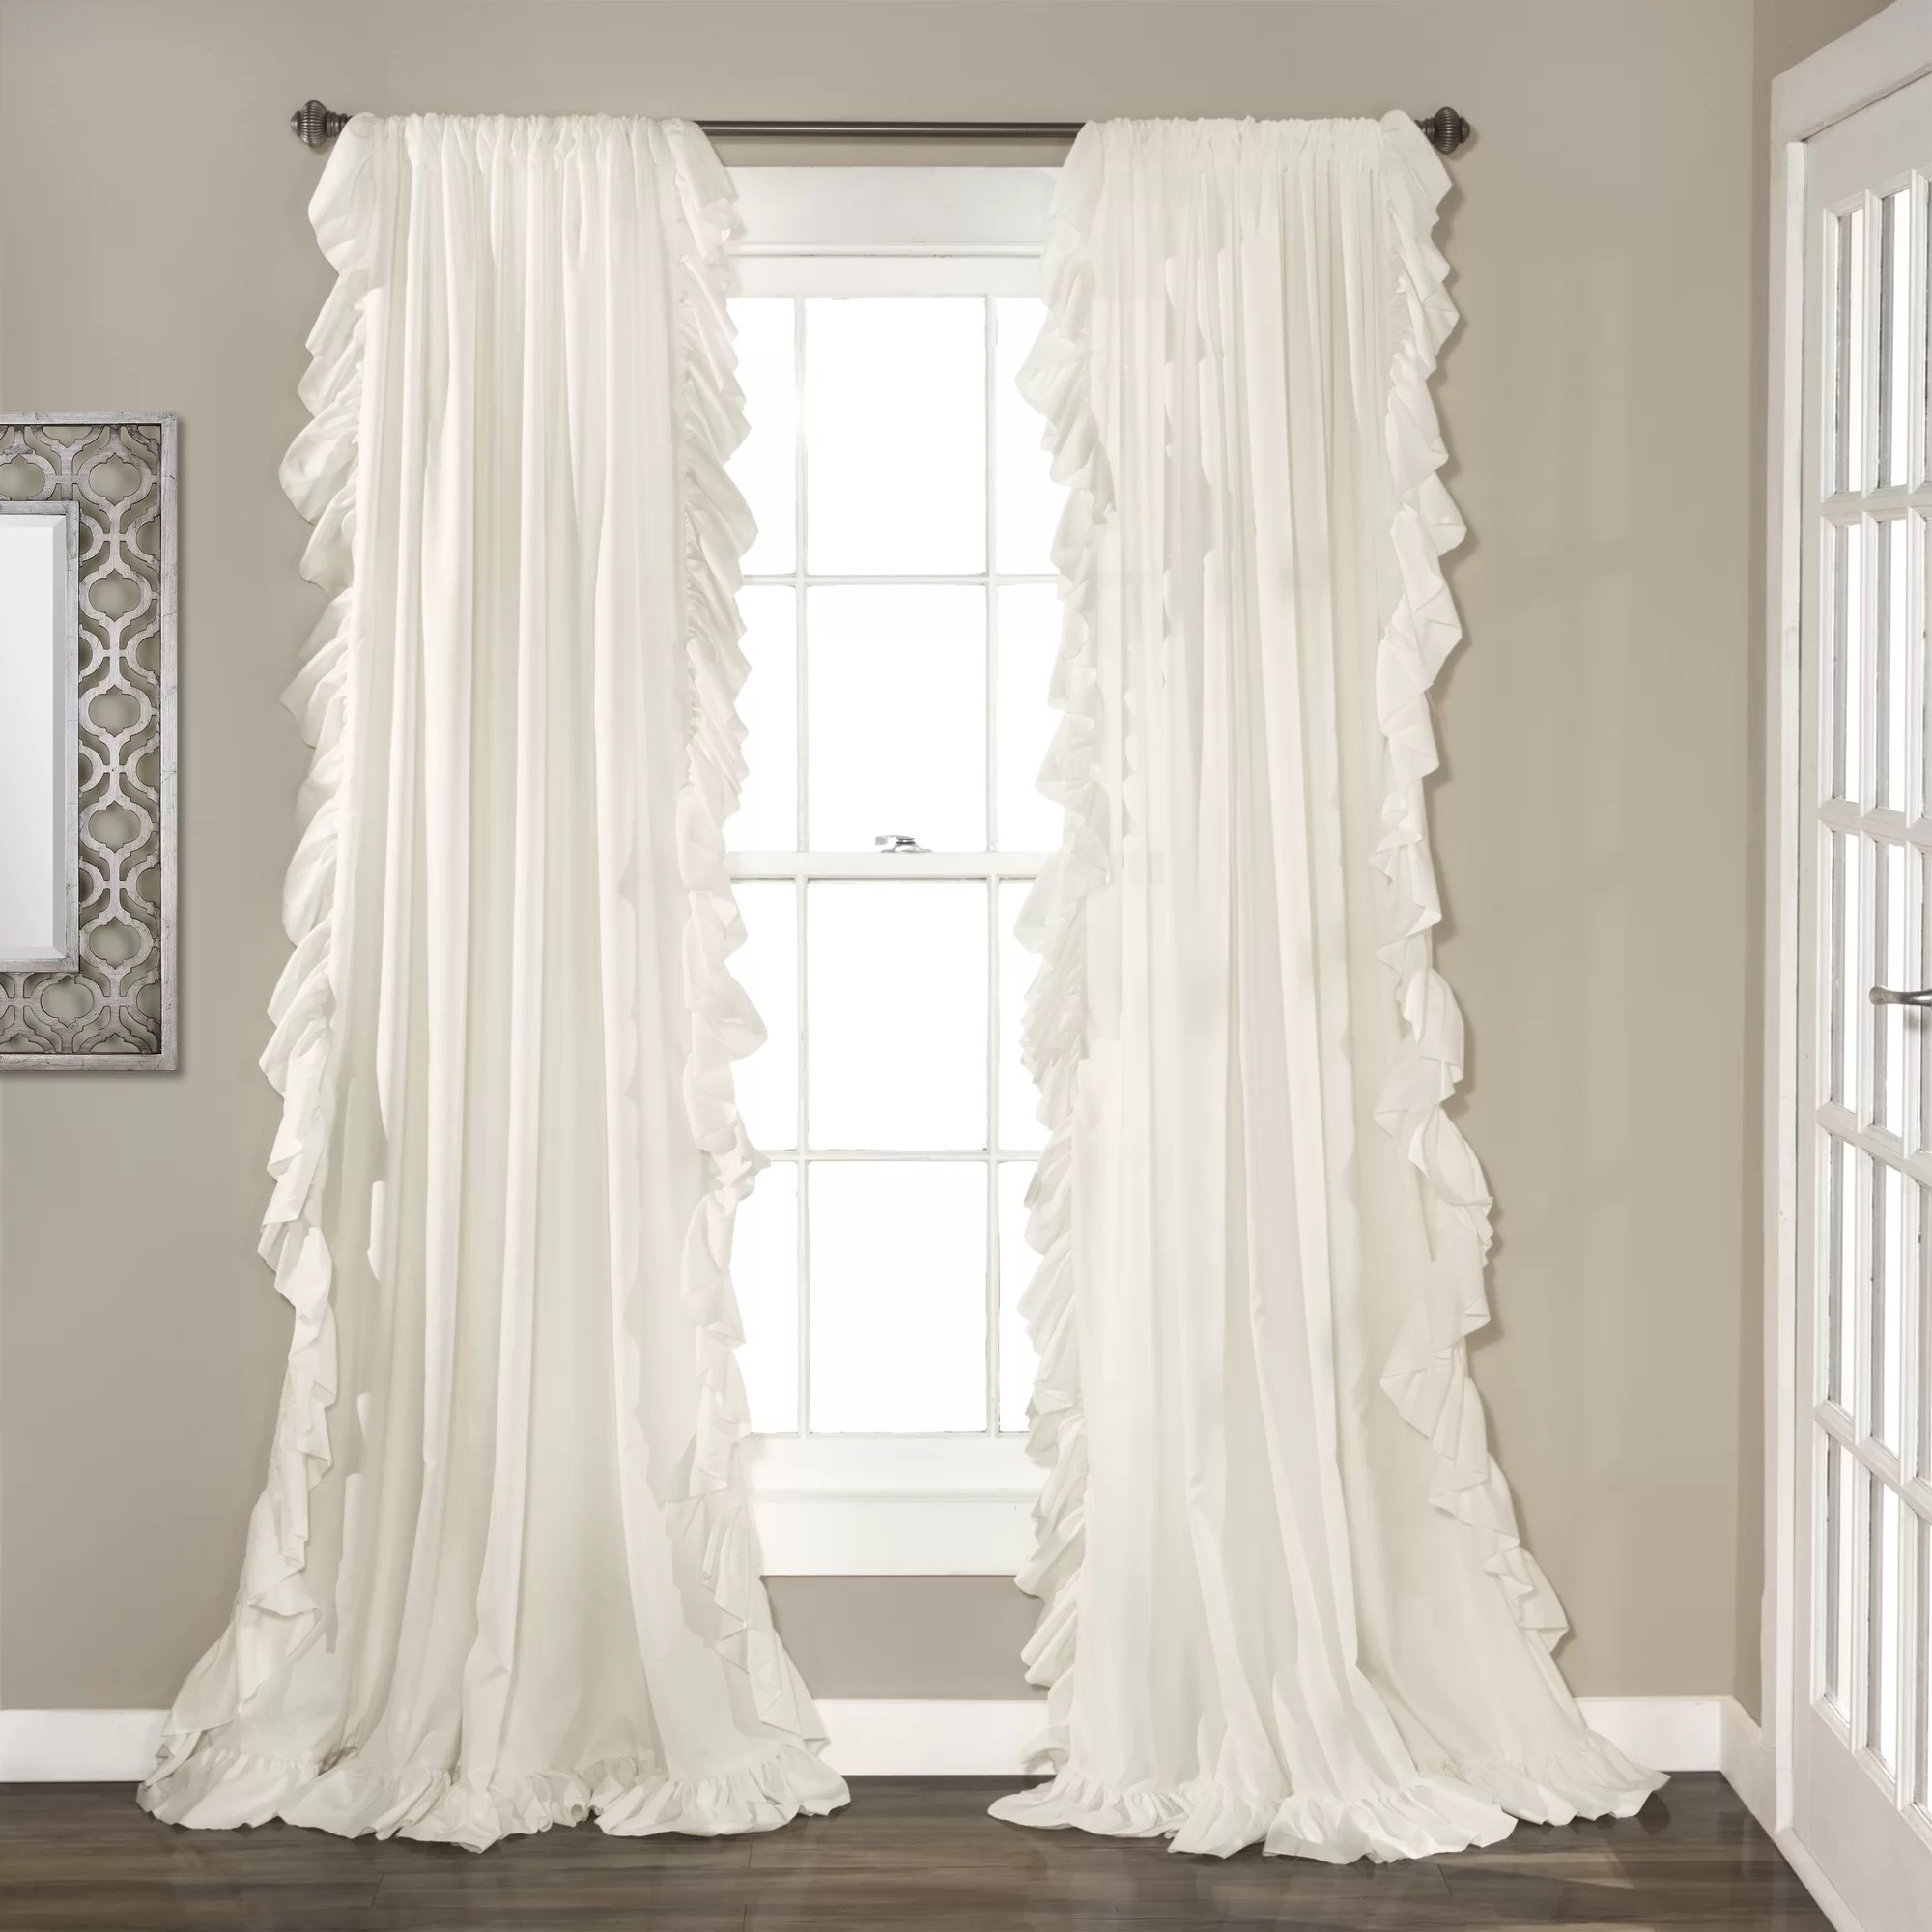 arngerus solid color semi sheer curtain panels